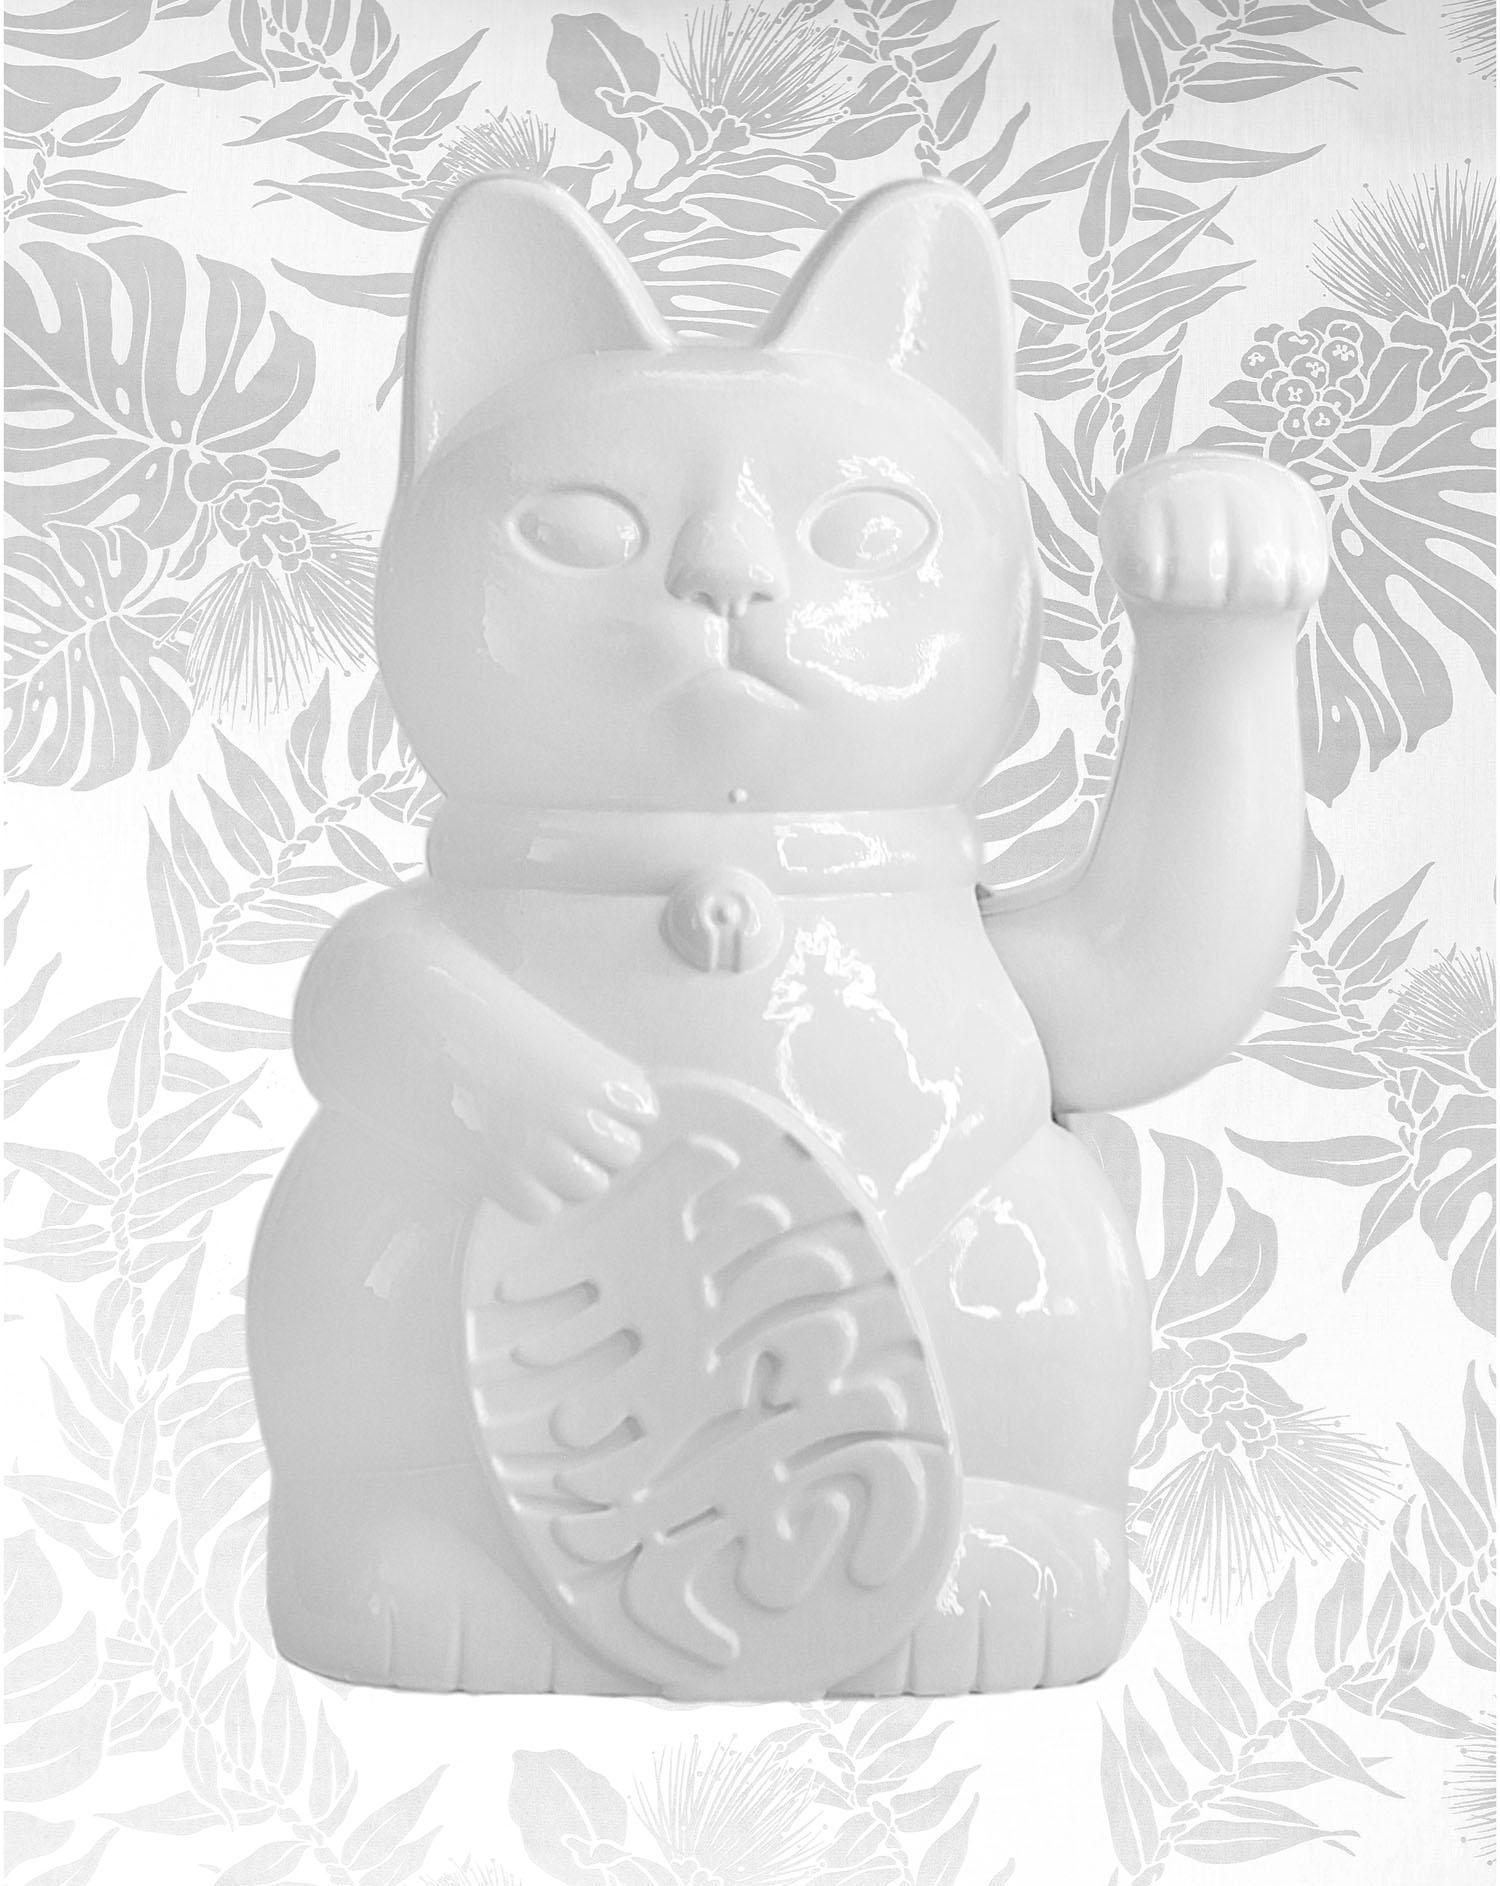 Image of White on White Maneki Neko